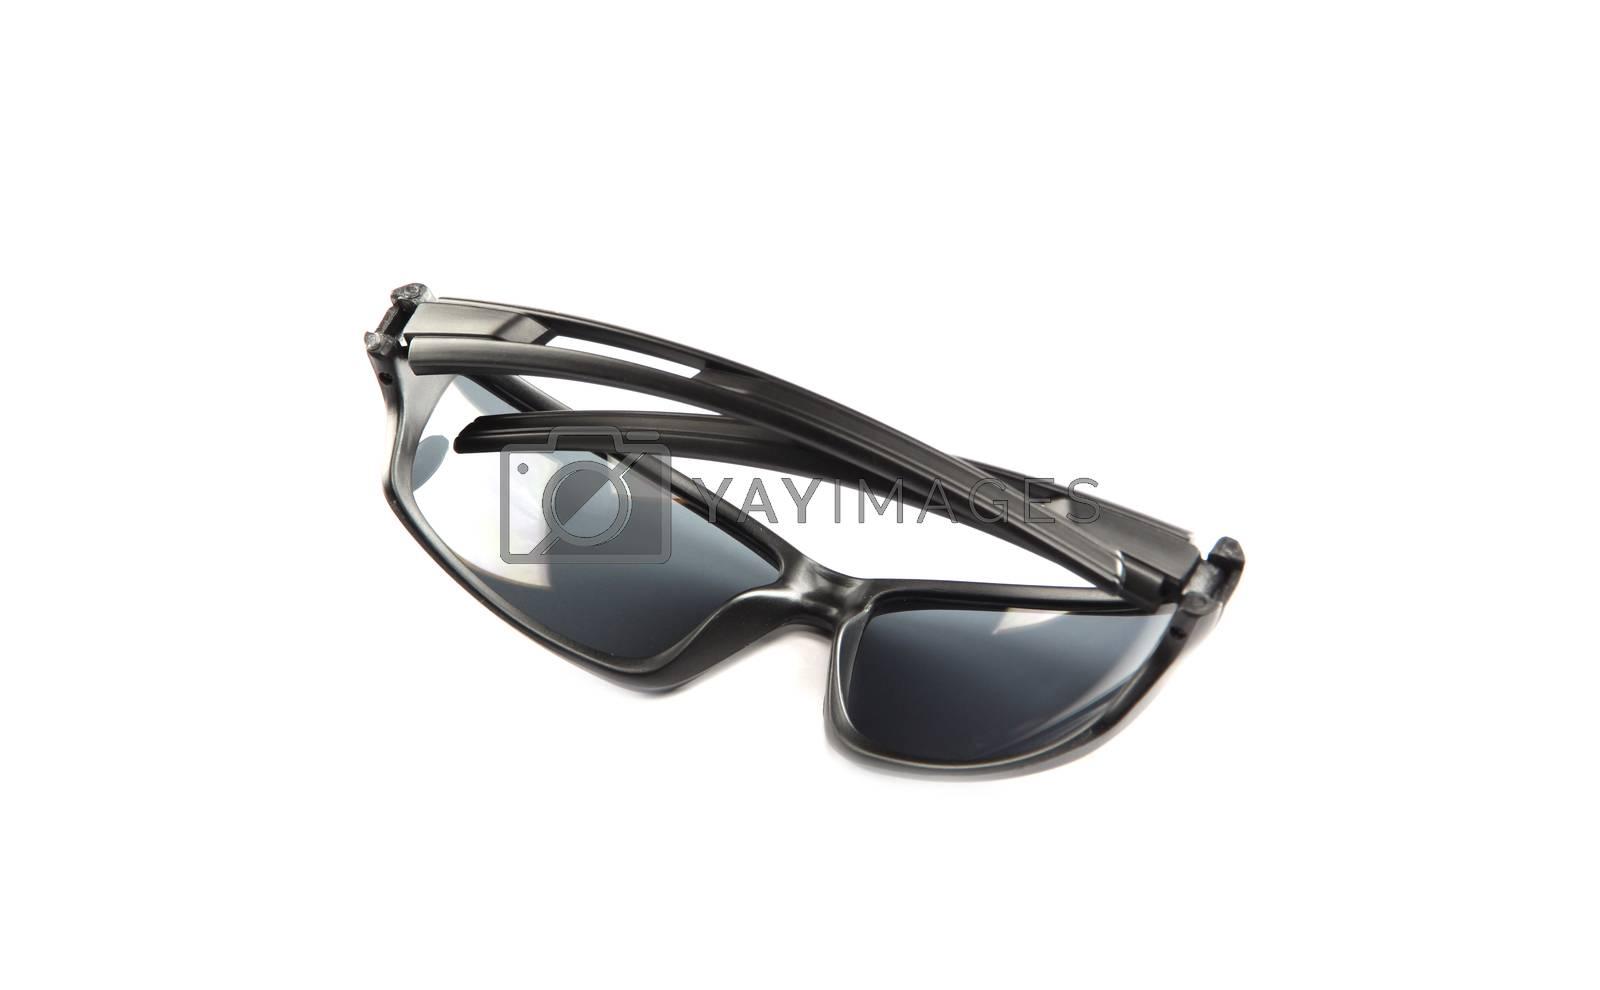 closeup black sunglasses isolated. by meepoohyaphoto